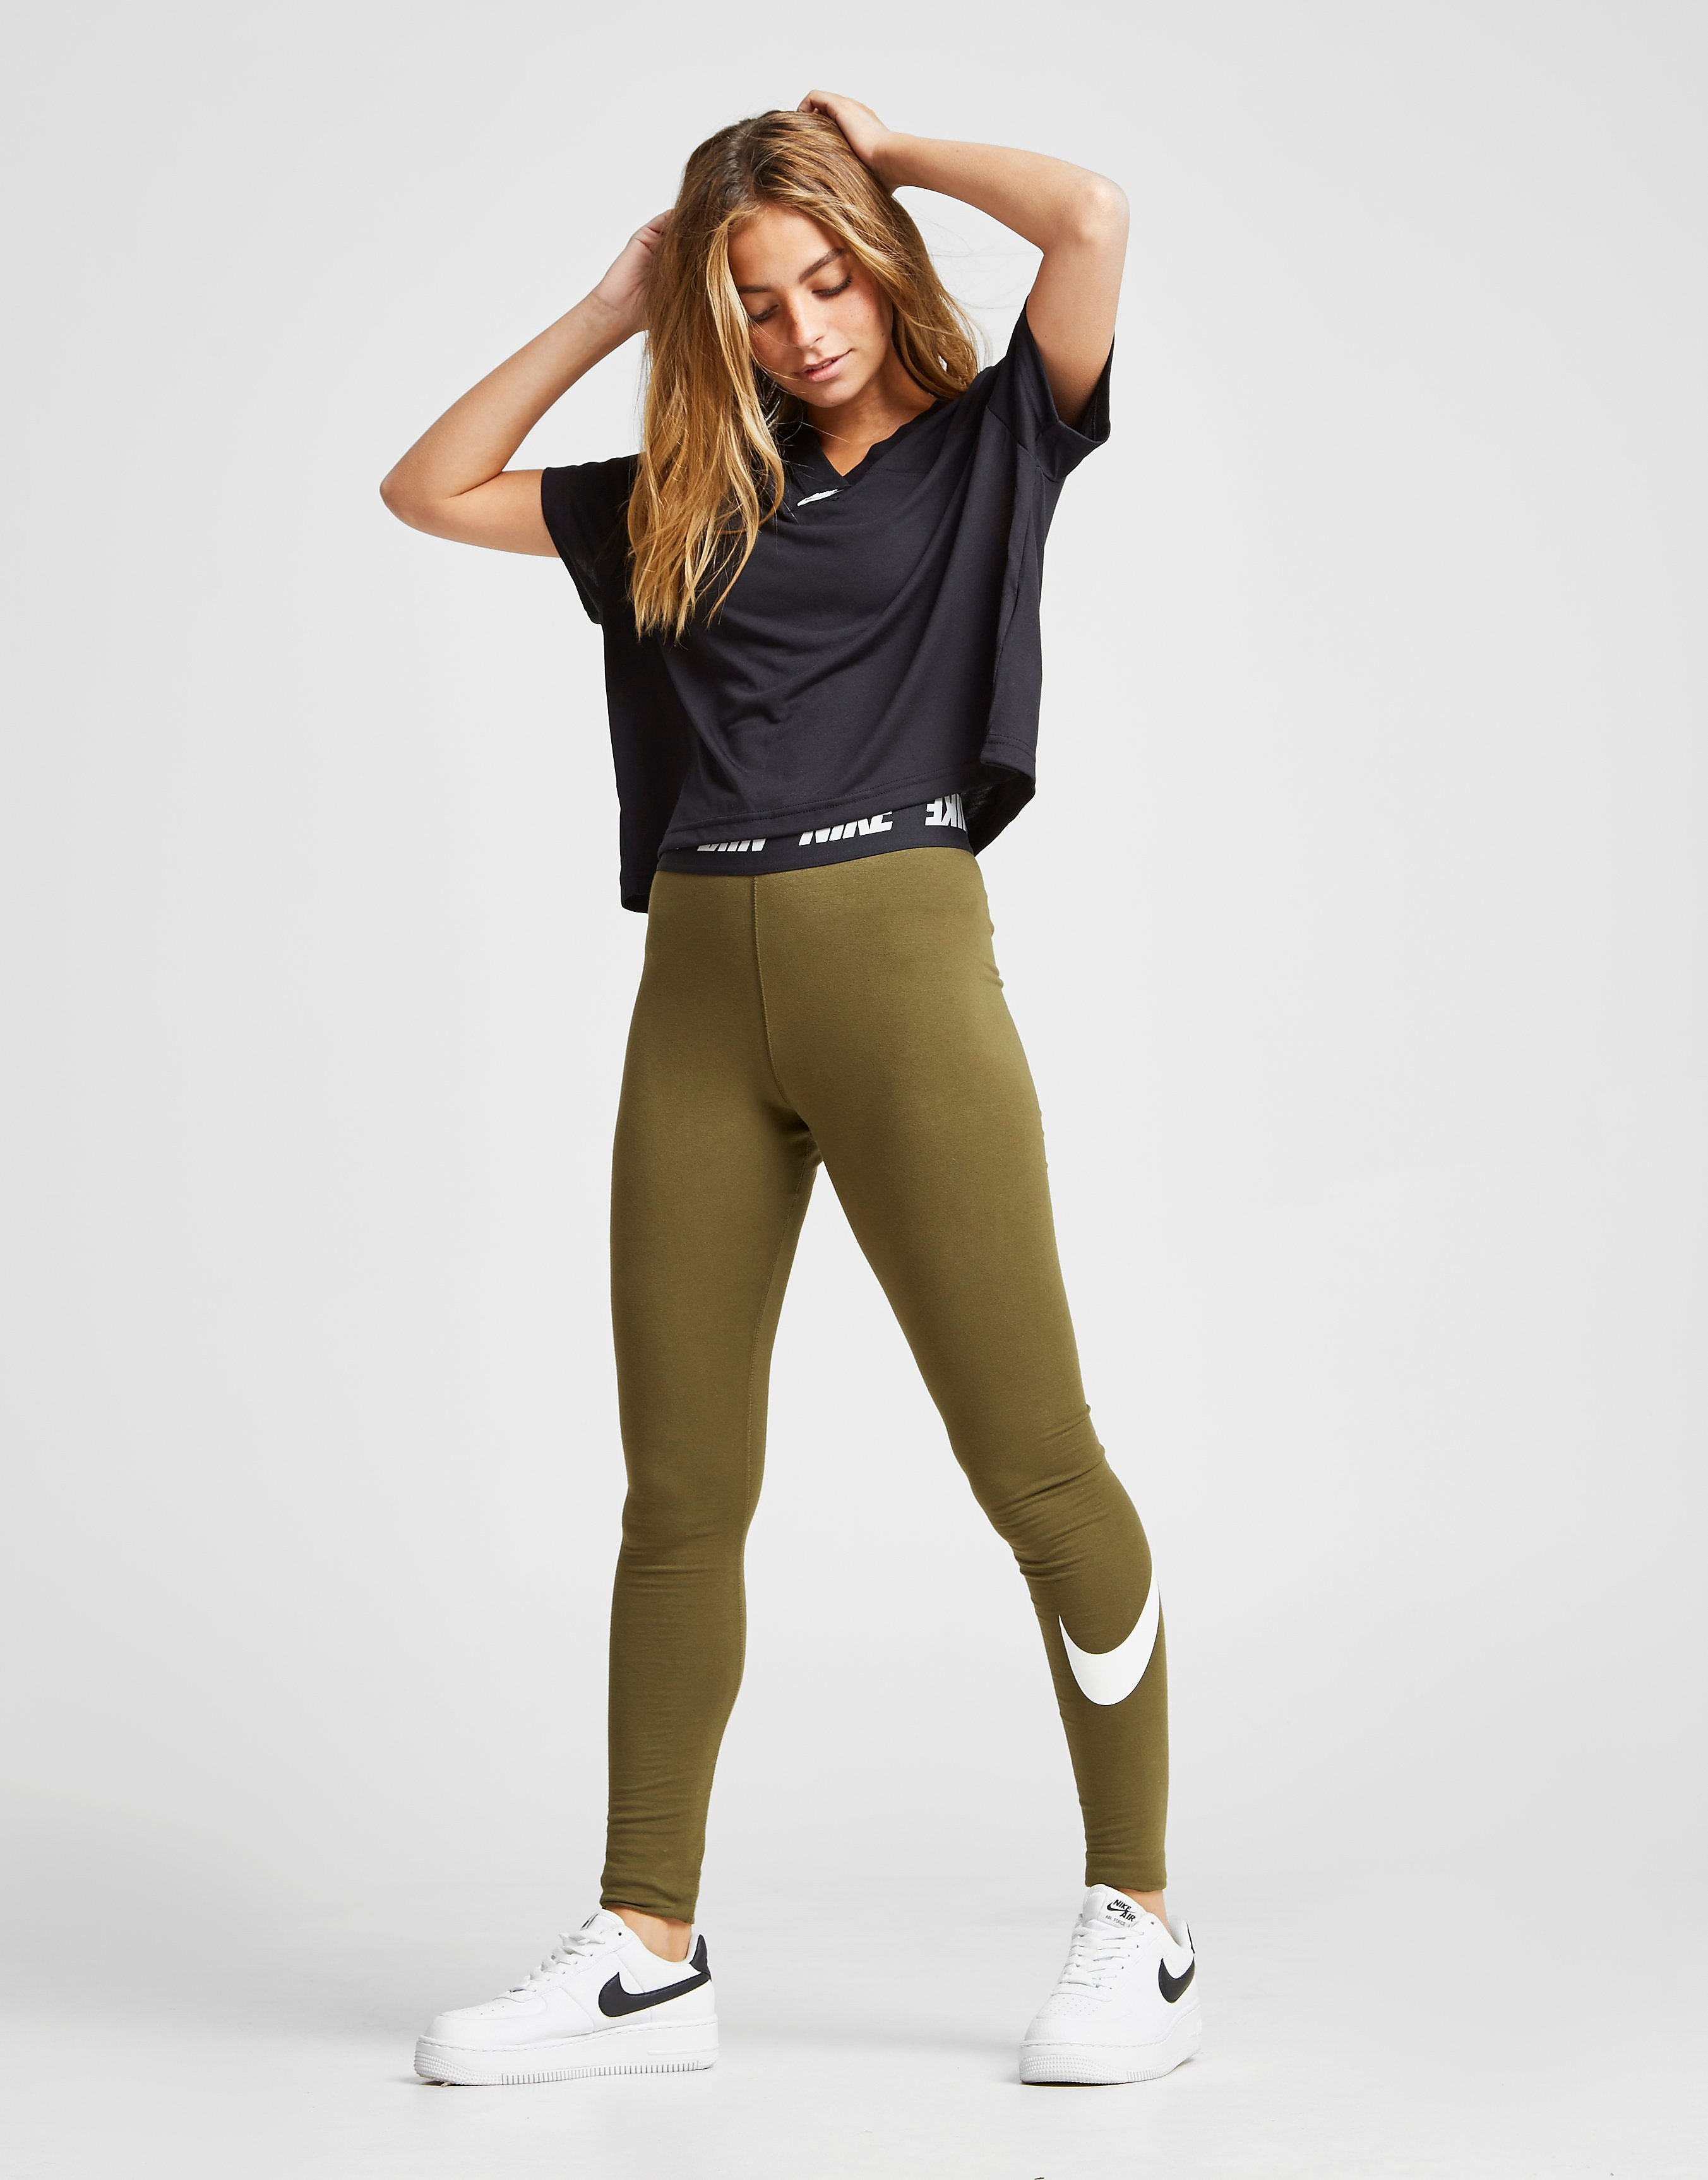 Nike camiseta Crop V